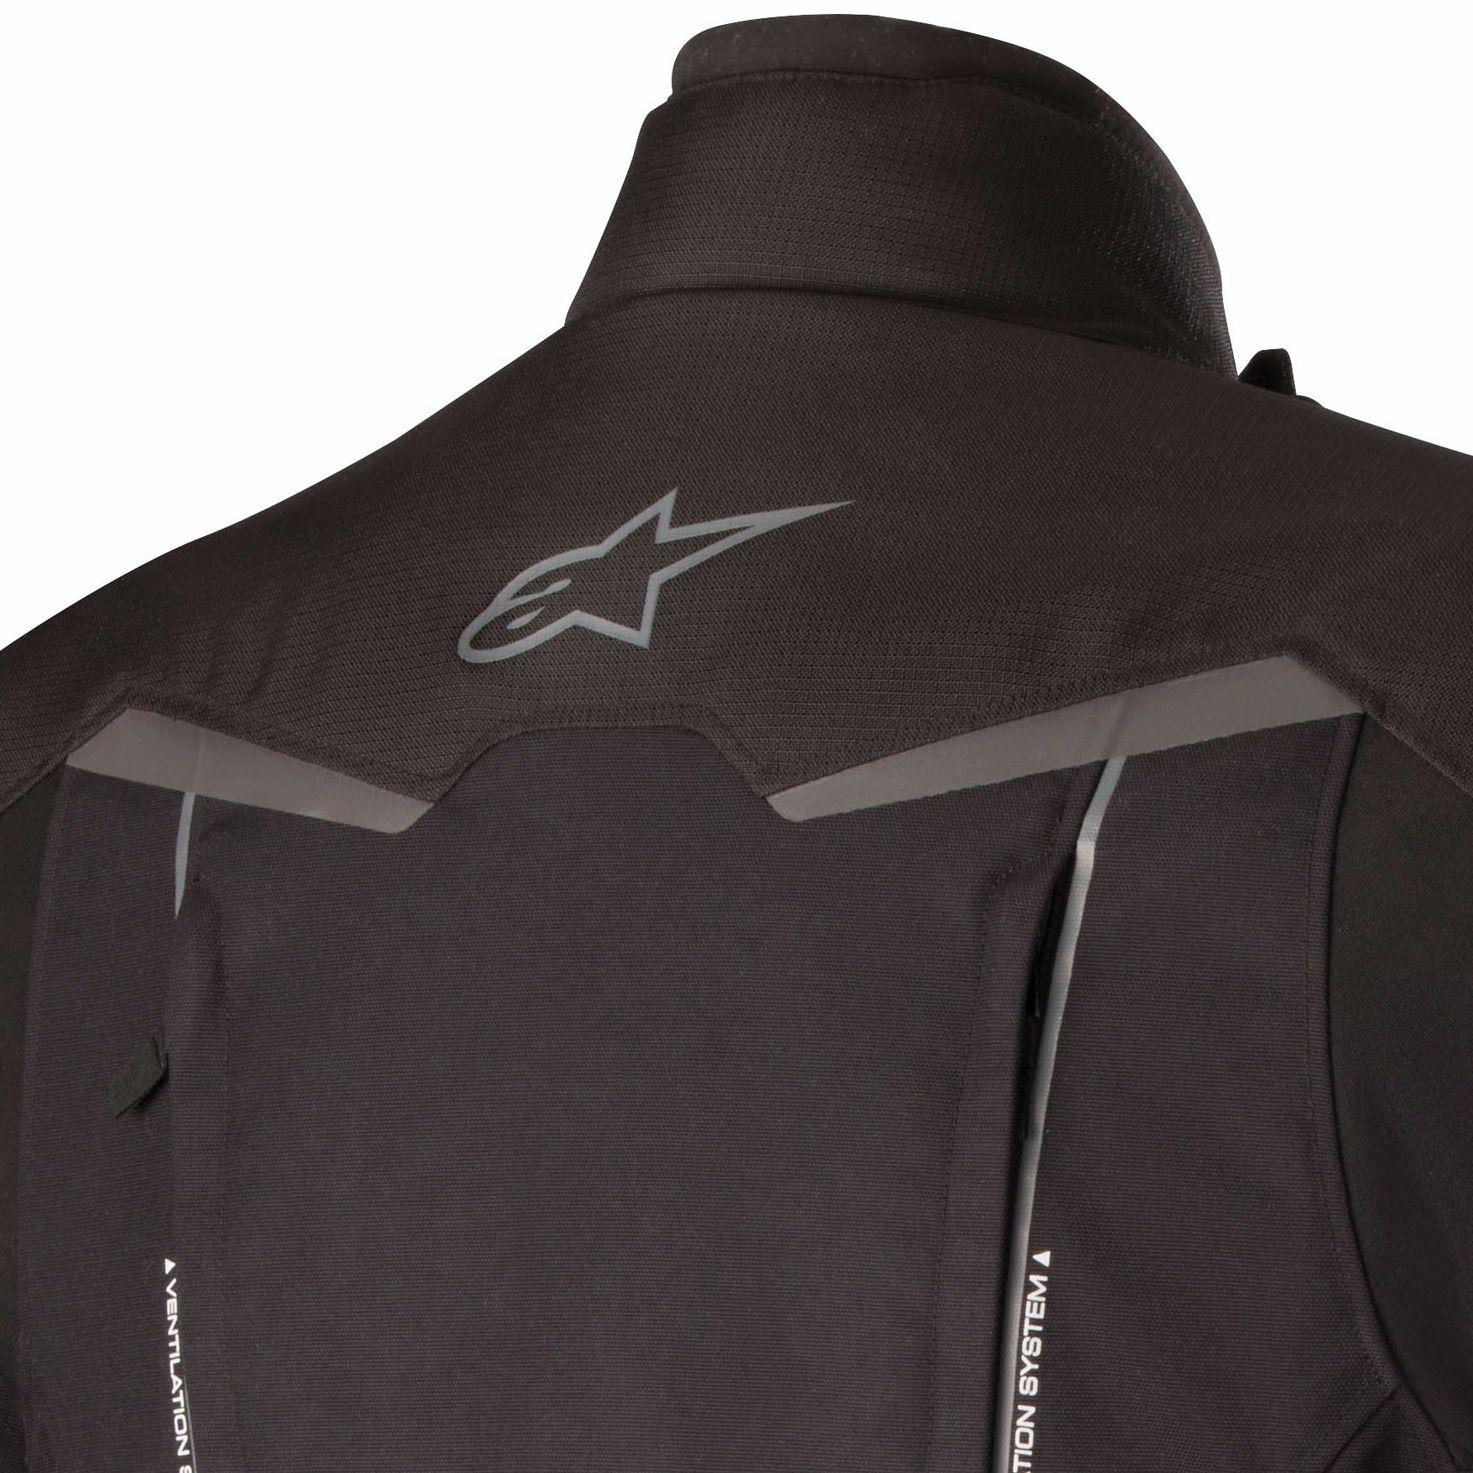 Chaqueta Alpinestars PATRON GORETEX - chaquetas de moto - Motoblouz.es